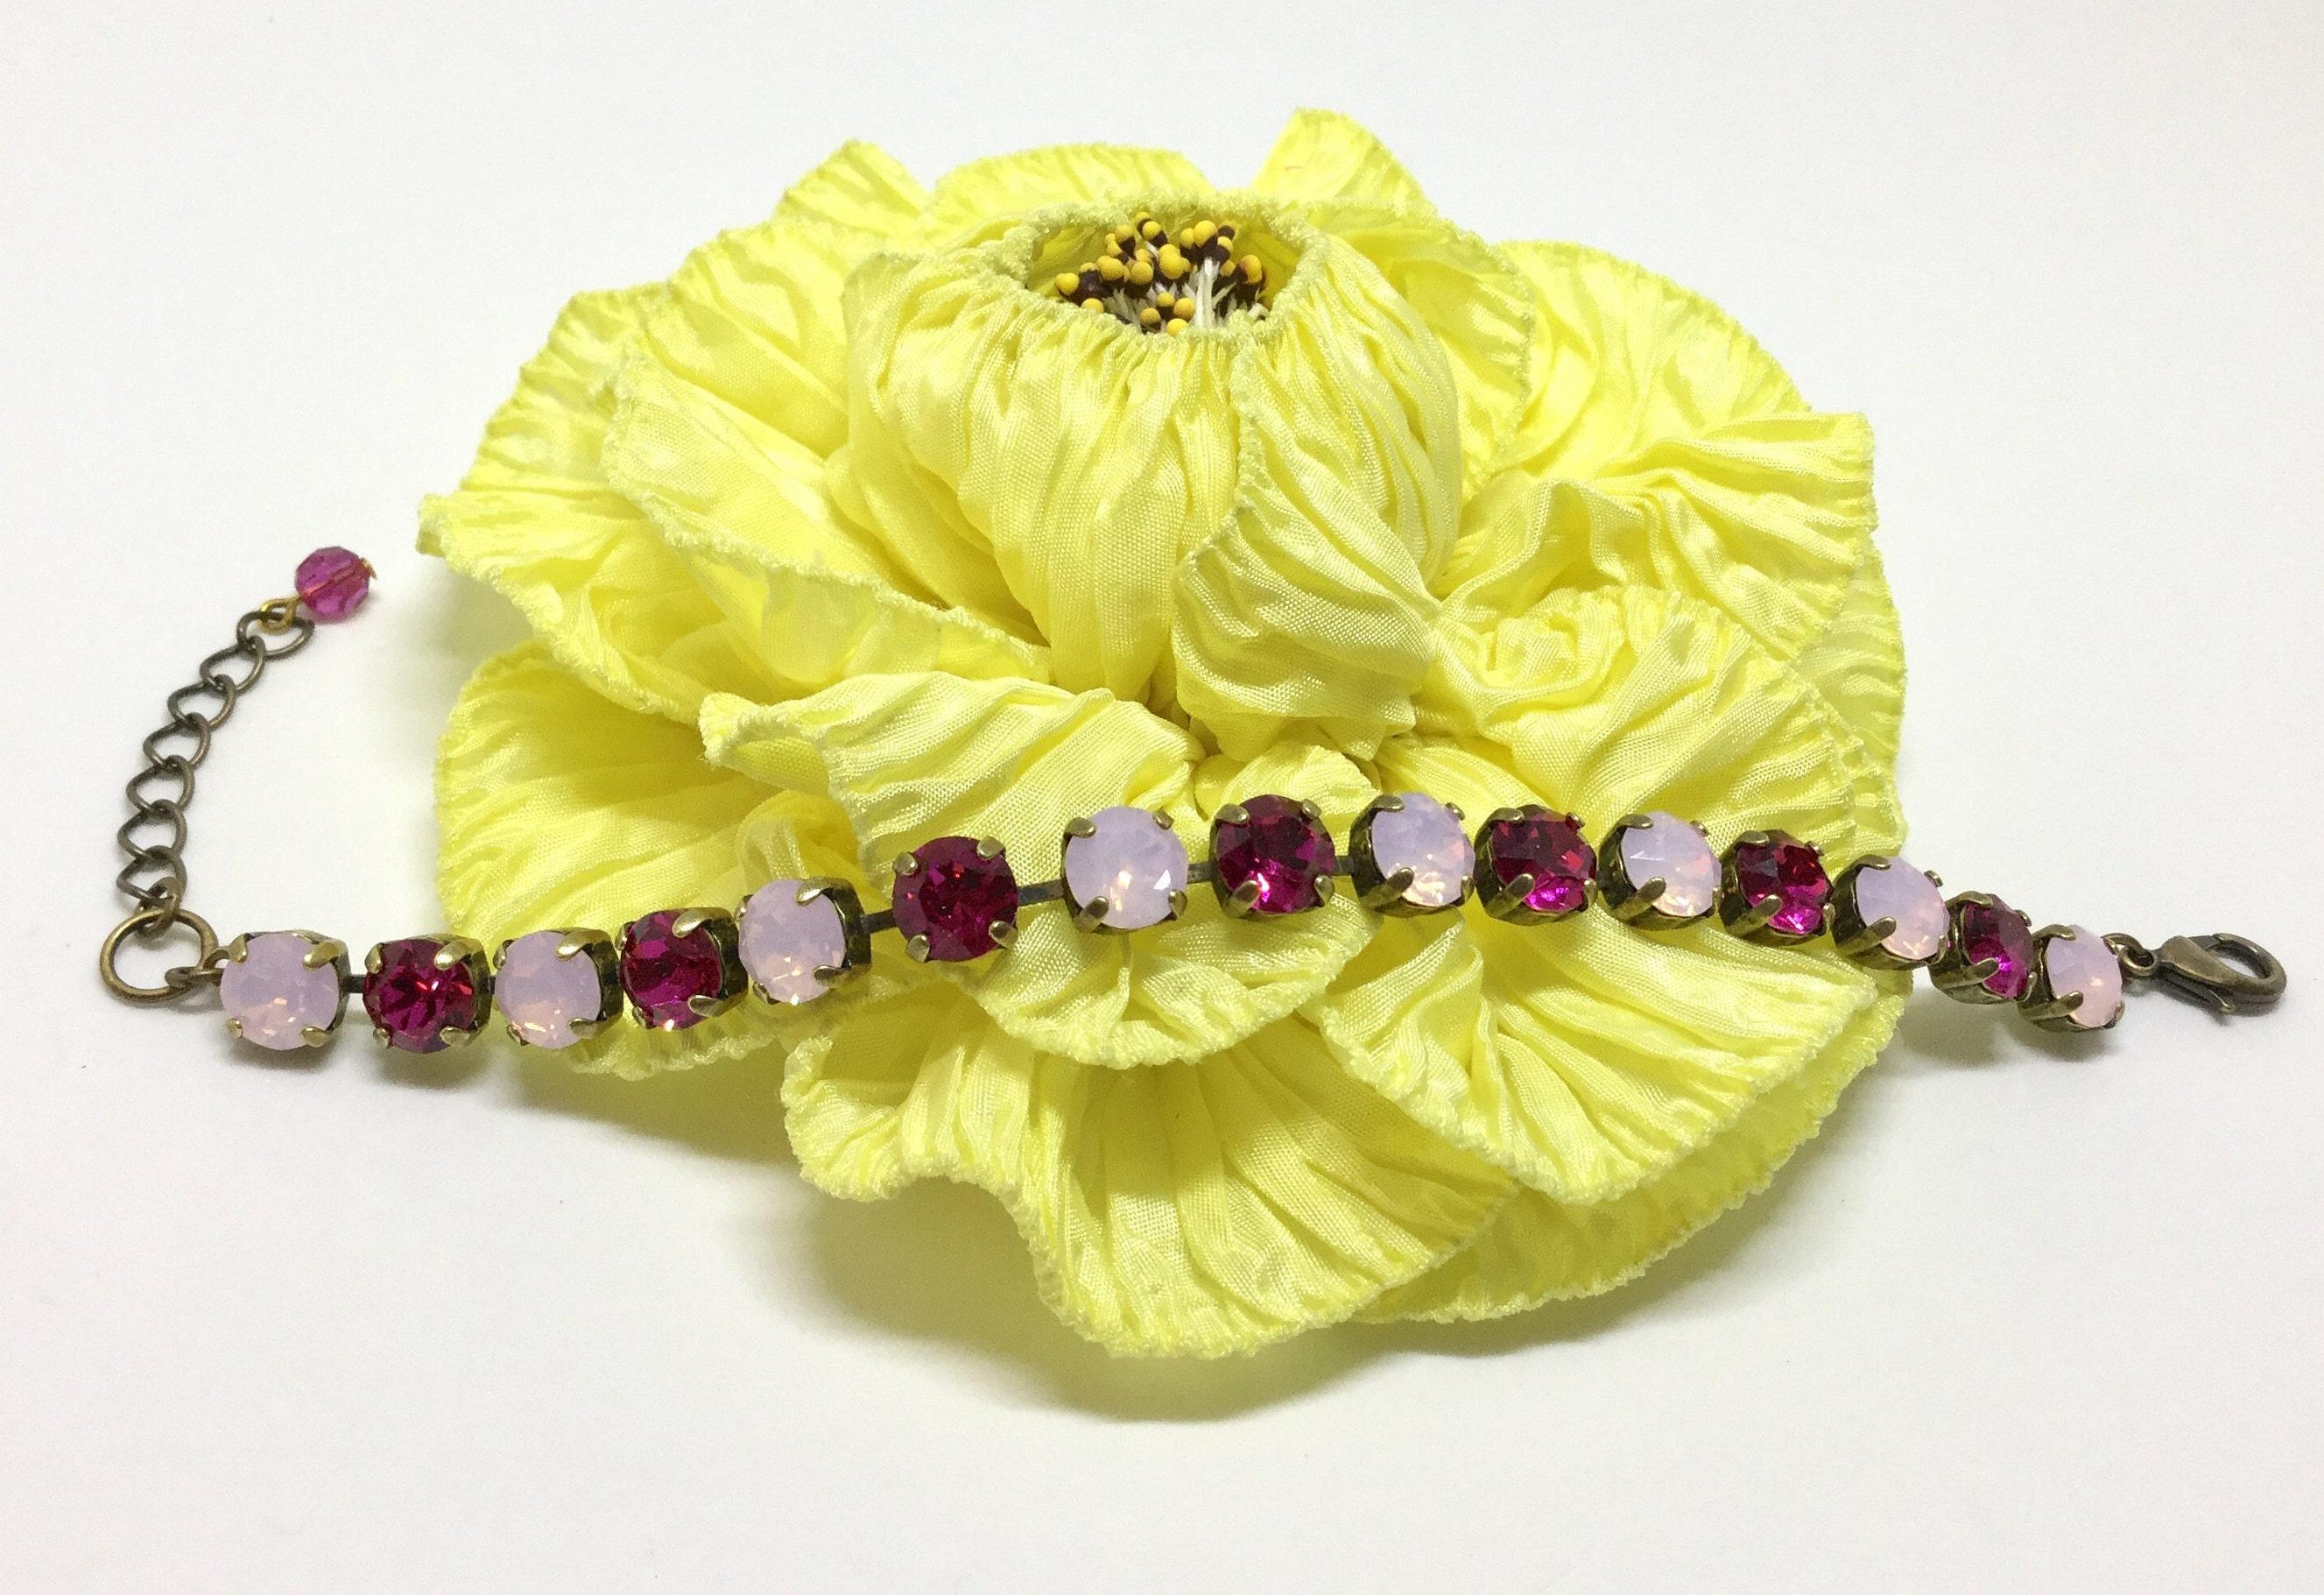 28c60f6923a3b Swarovski Crystal Bracelet, Alternating Rosewater Opal & Fuchsia ...